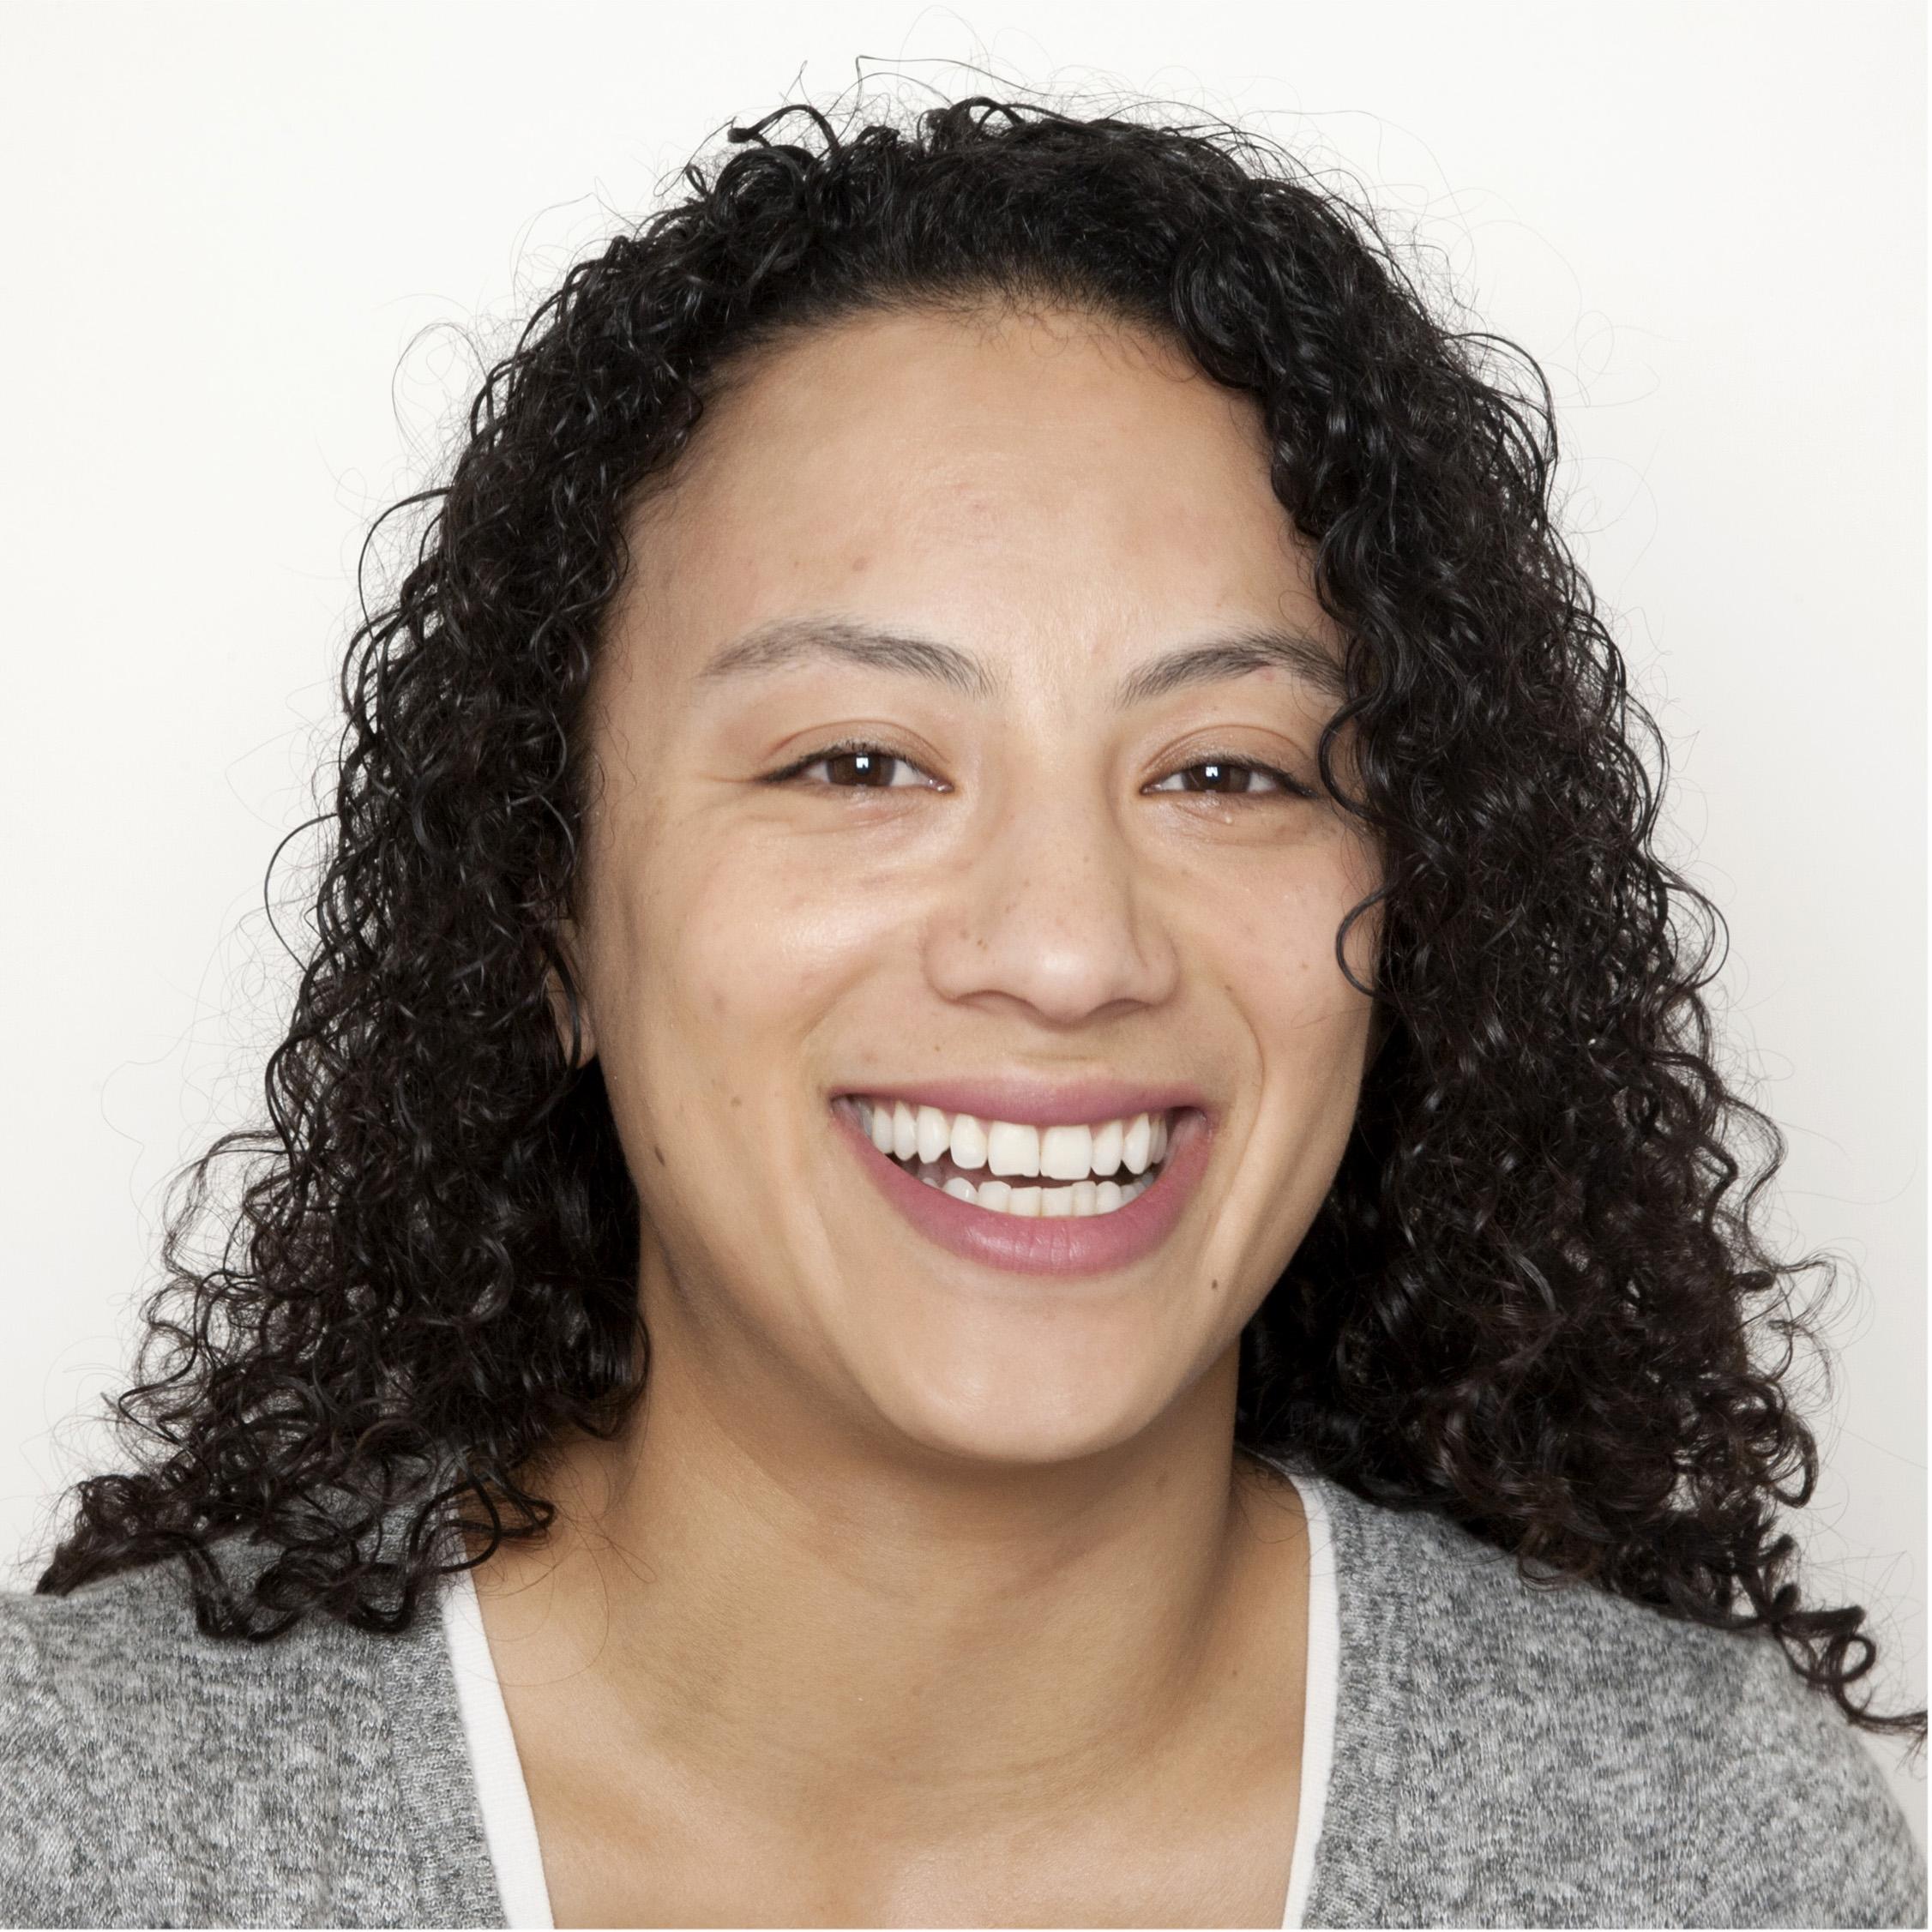 Aleisha Langmann